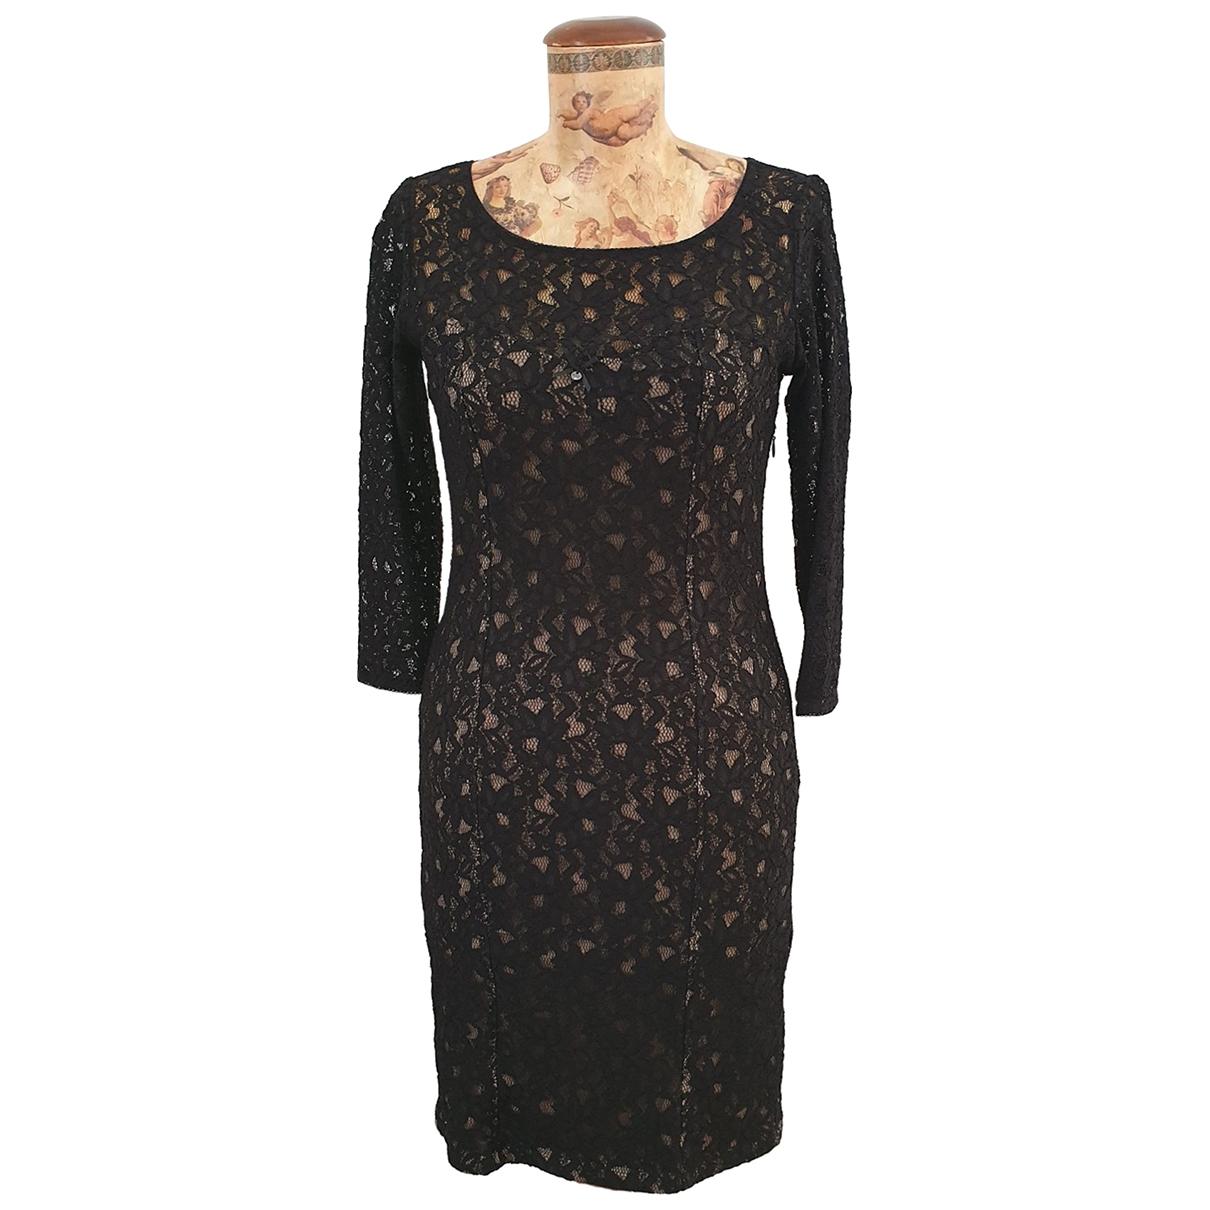 Guess \N Black Cotton - elasthane dress for Women 42 IT